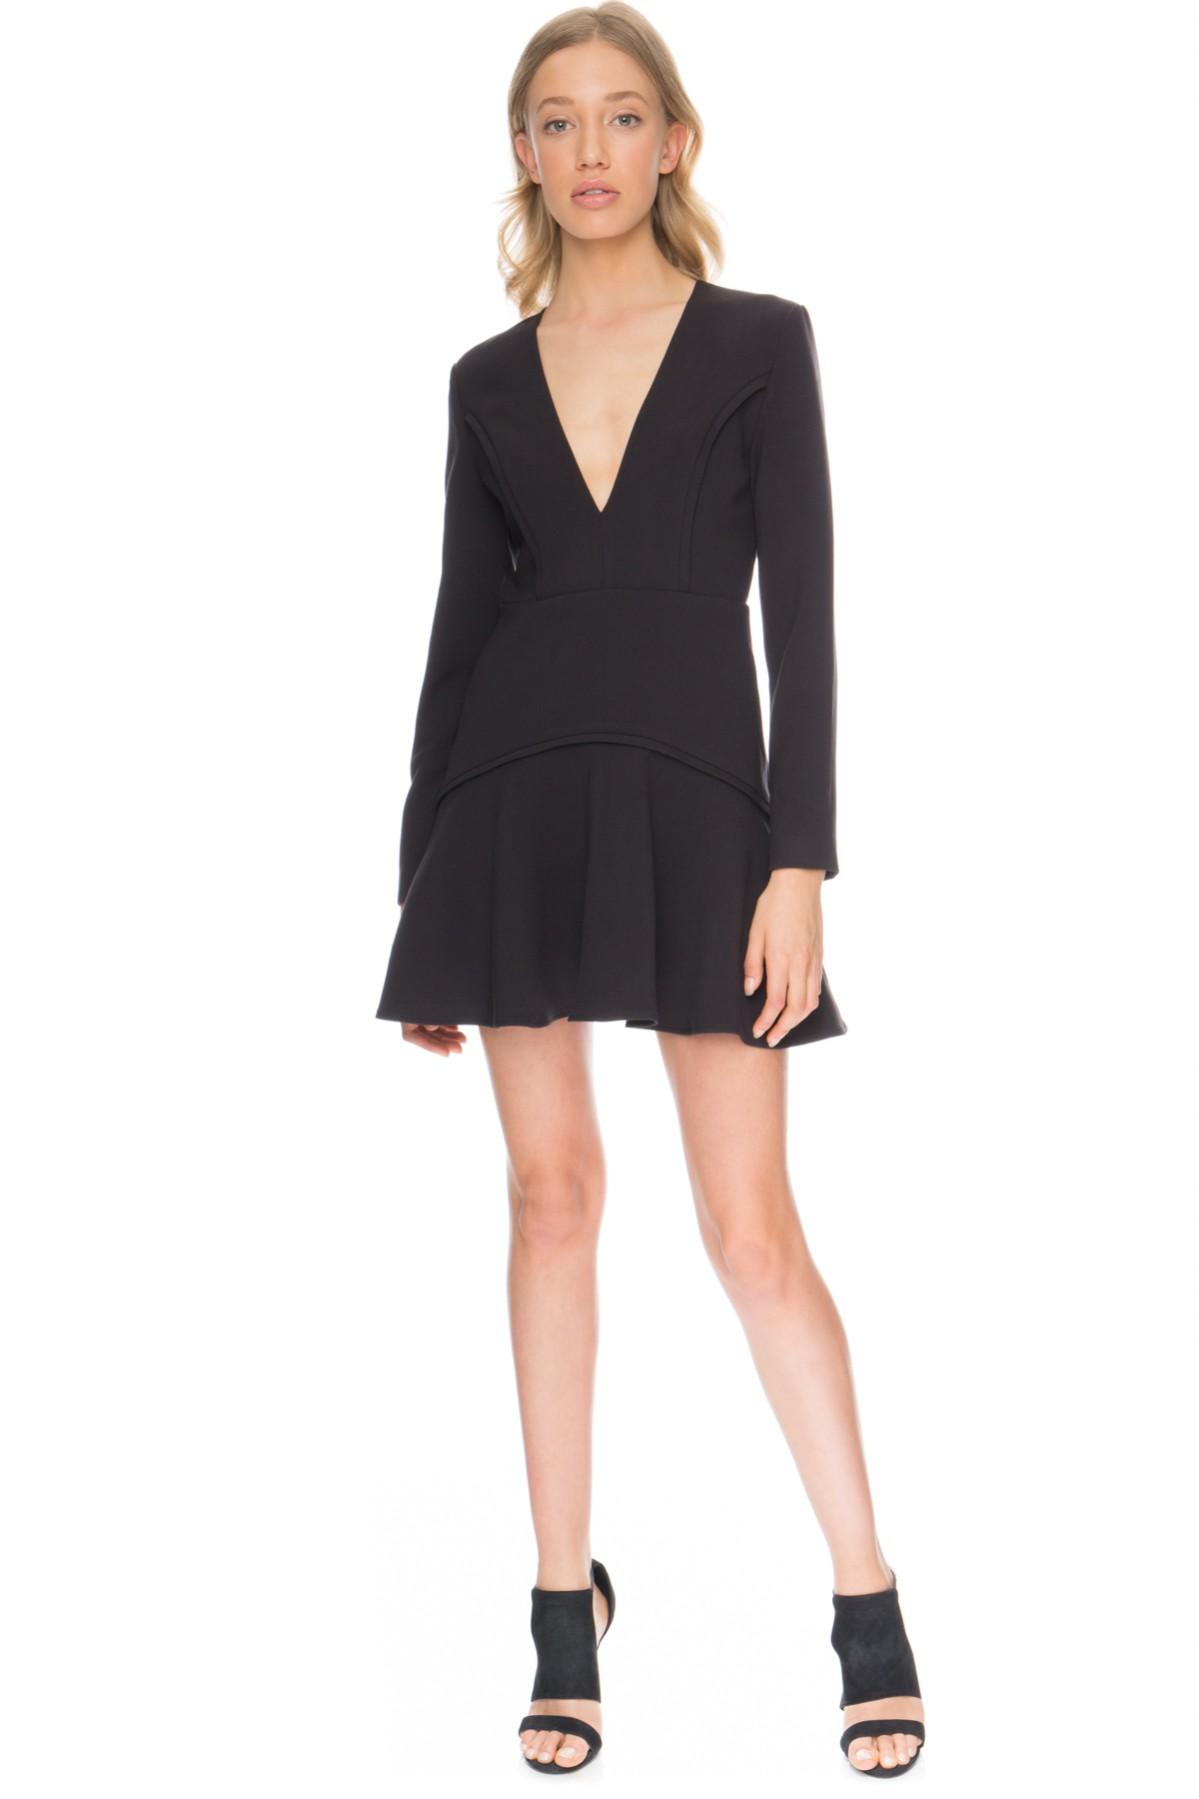 Shop Finders Round Up Dress.